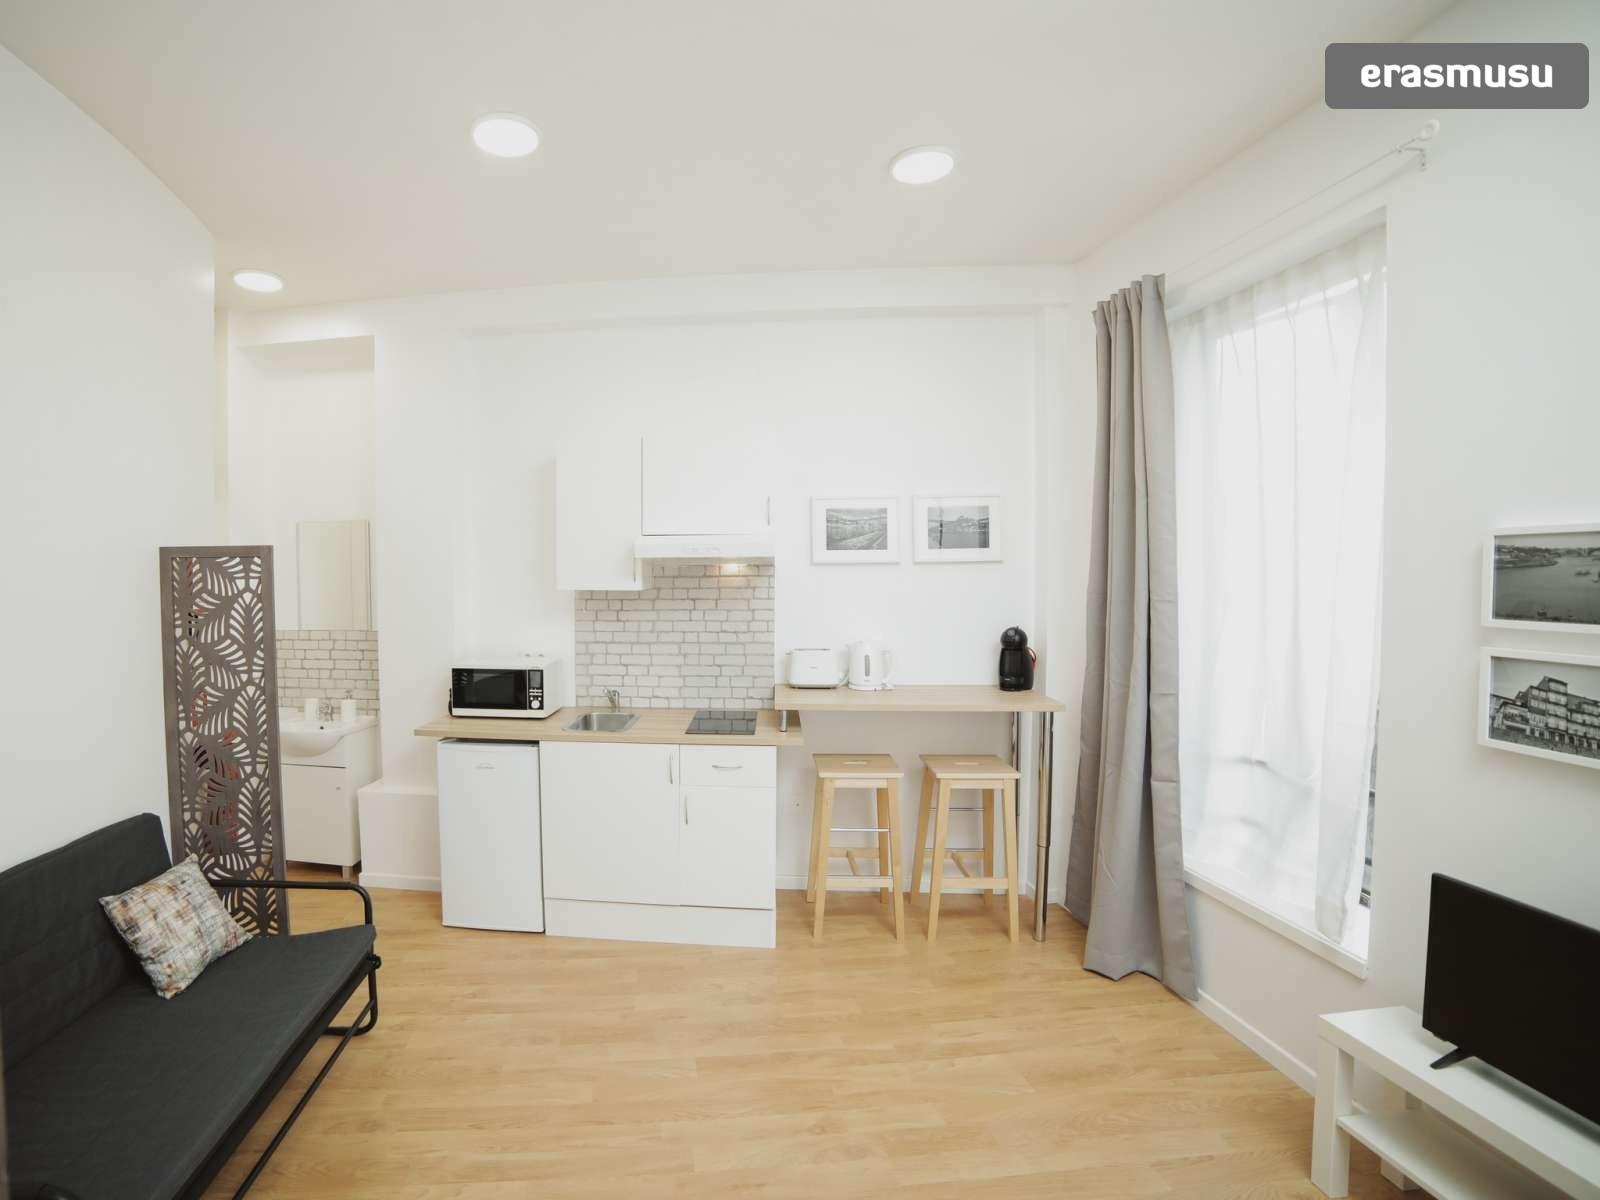 stunning-studio-apartment-rent-santo-ildefonso-86a9dd8bf47e51ab0